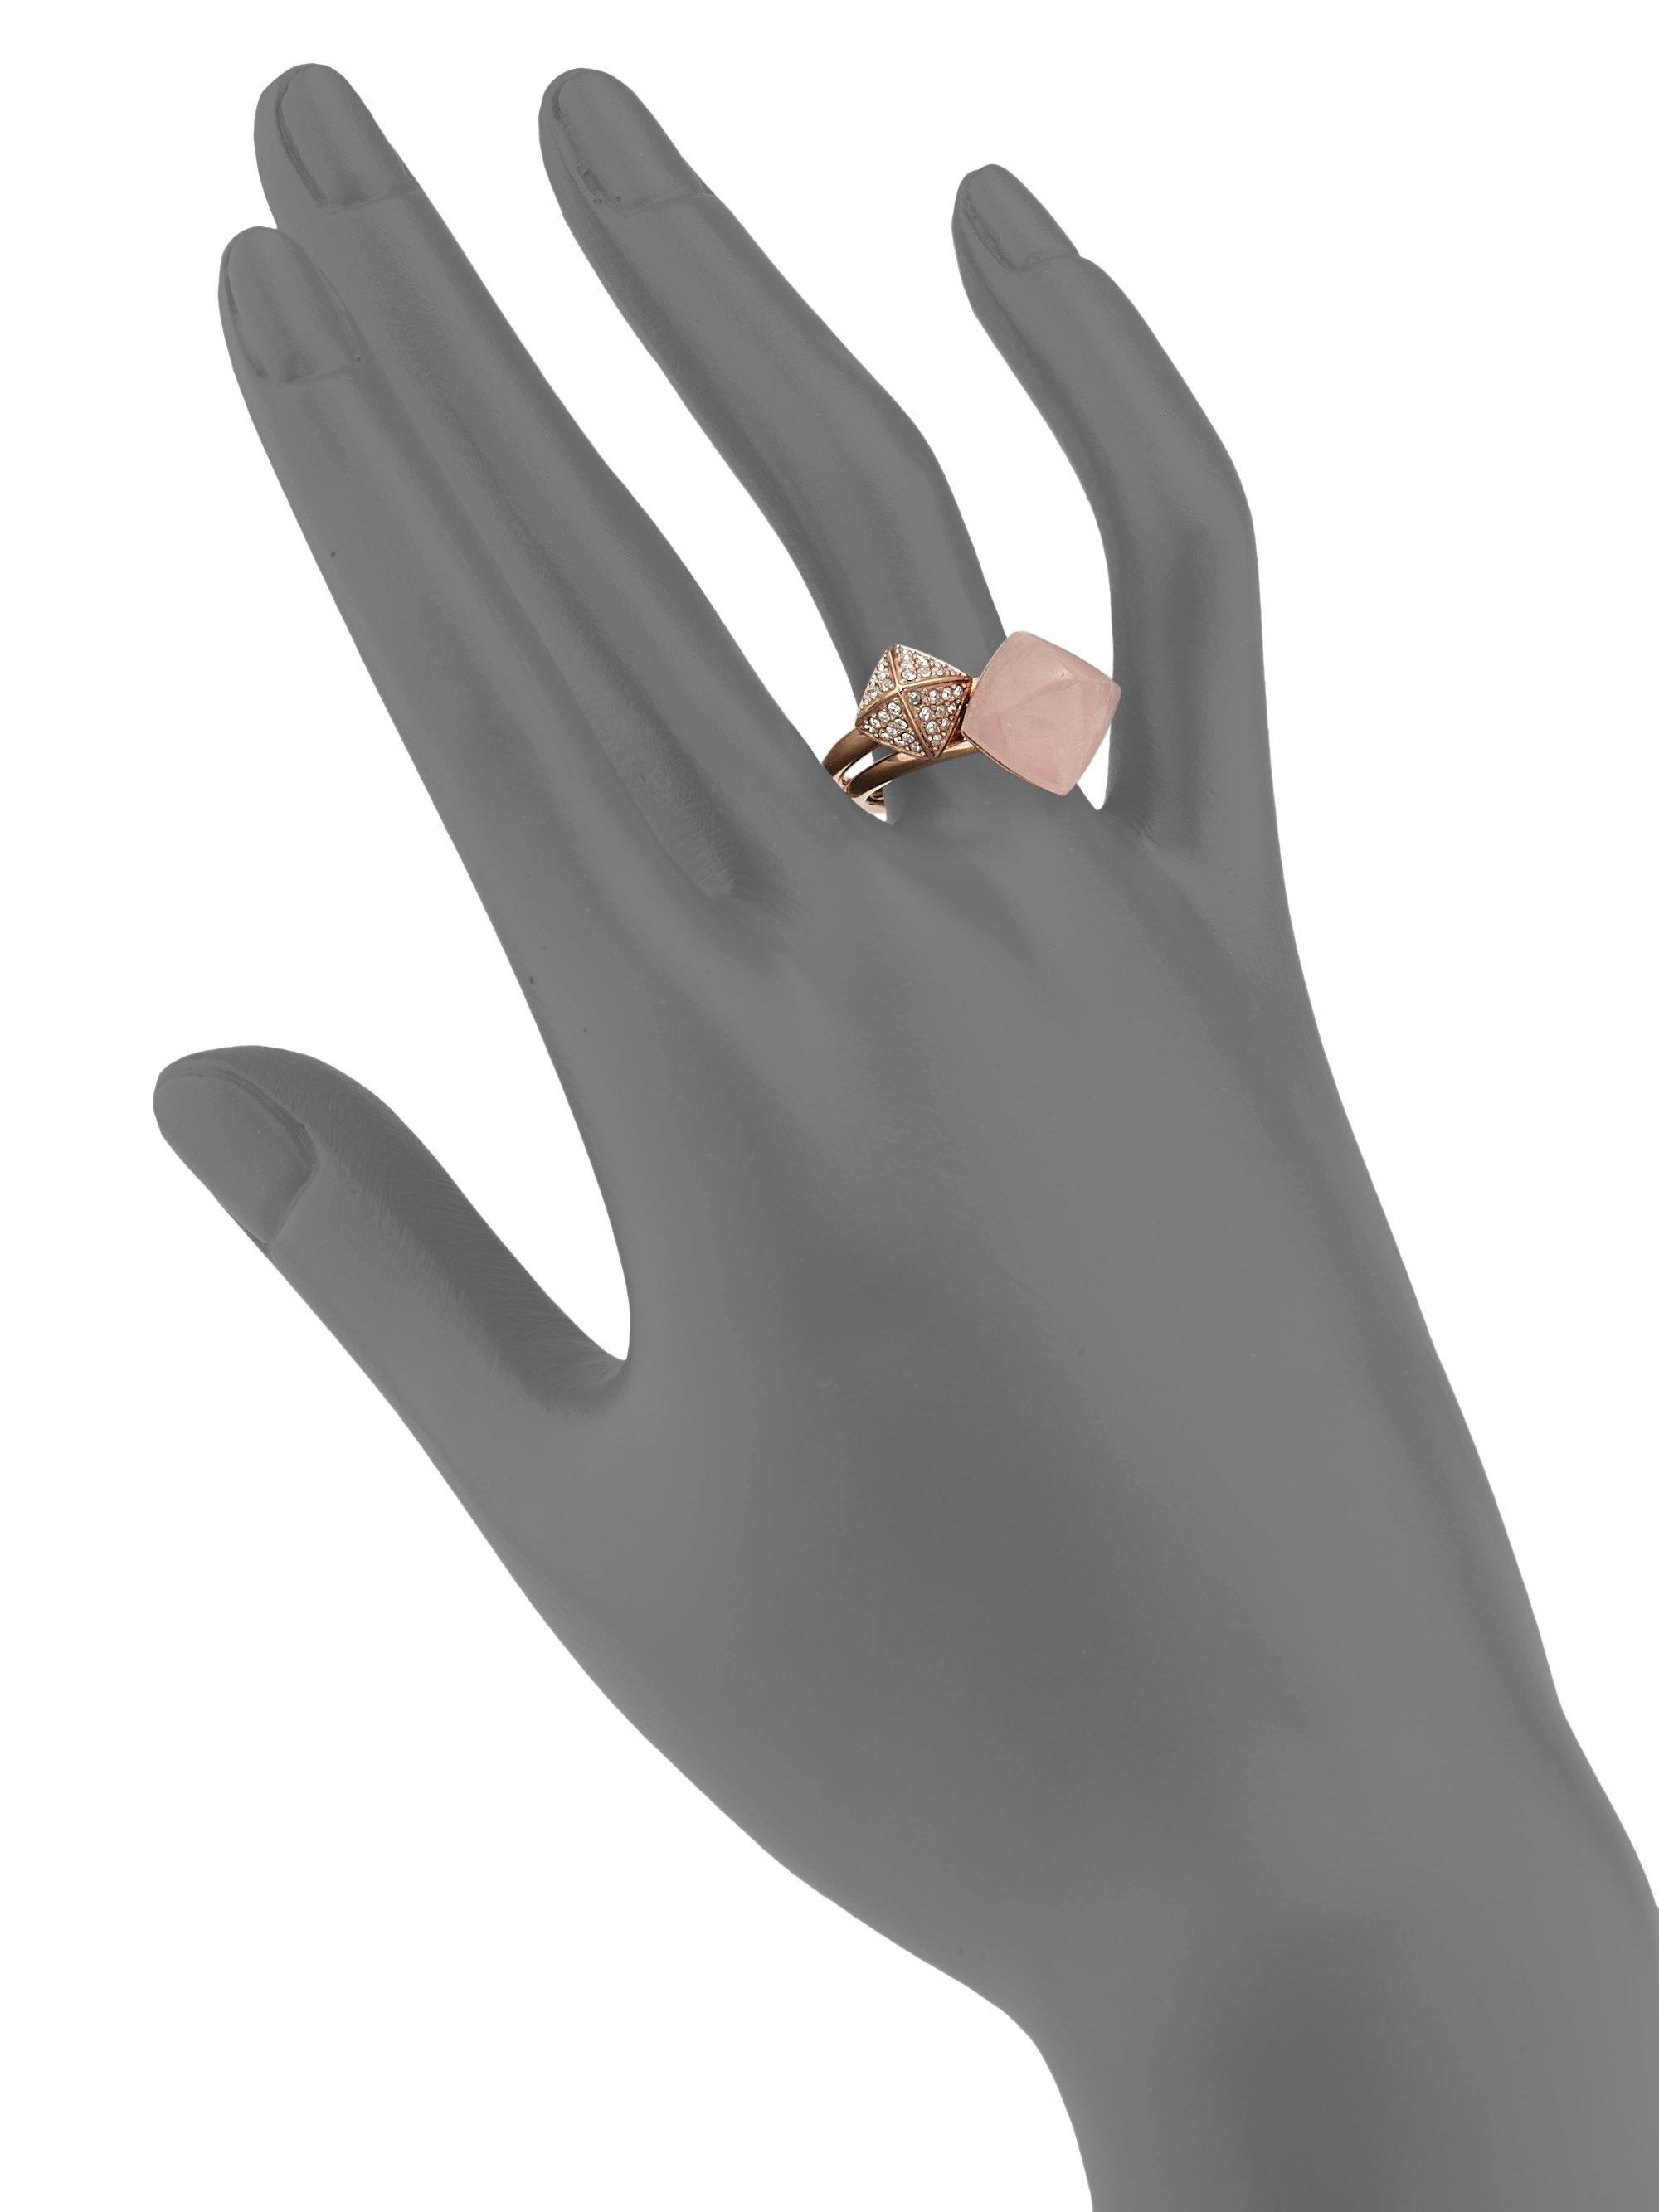 Michael kors Rose Quartz Pave Pyramid Ring Set in Pink